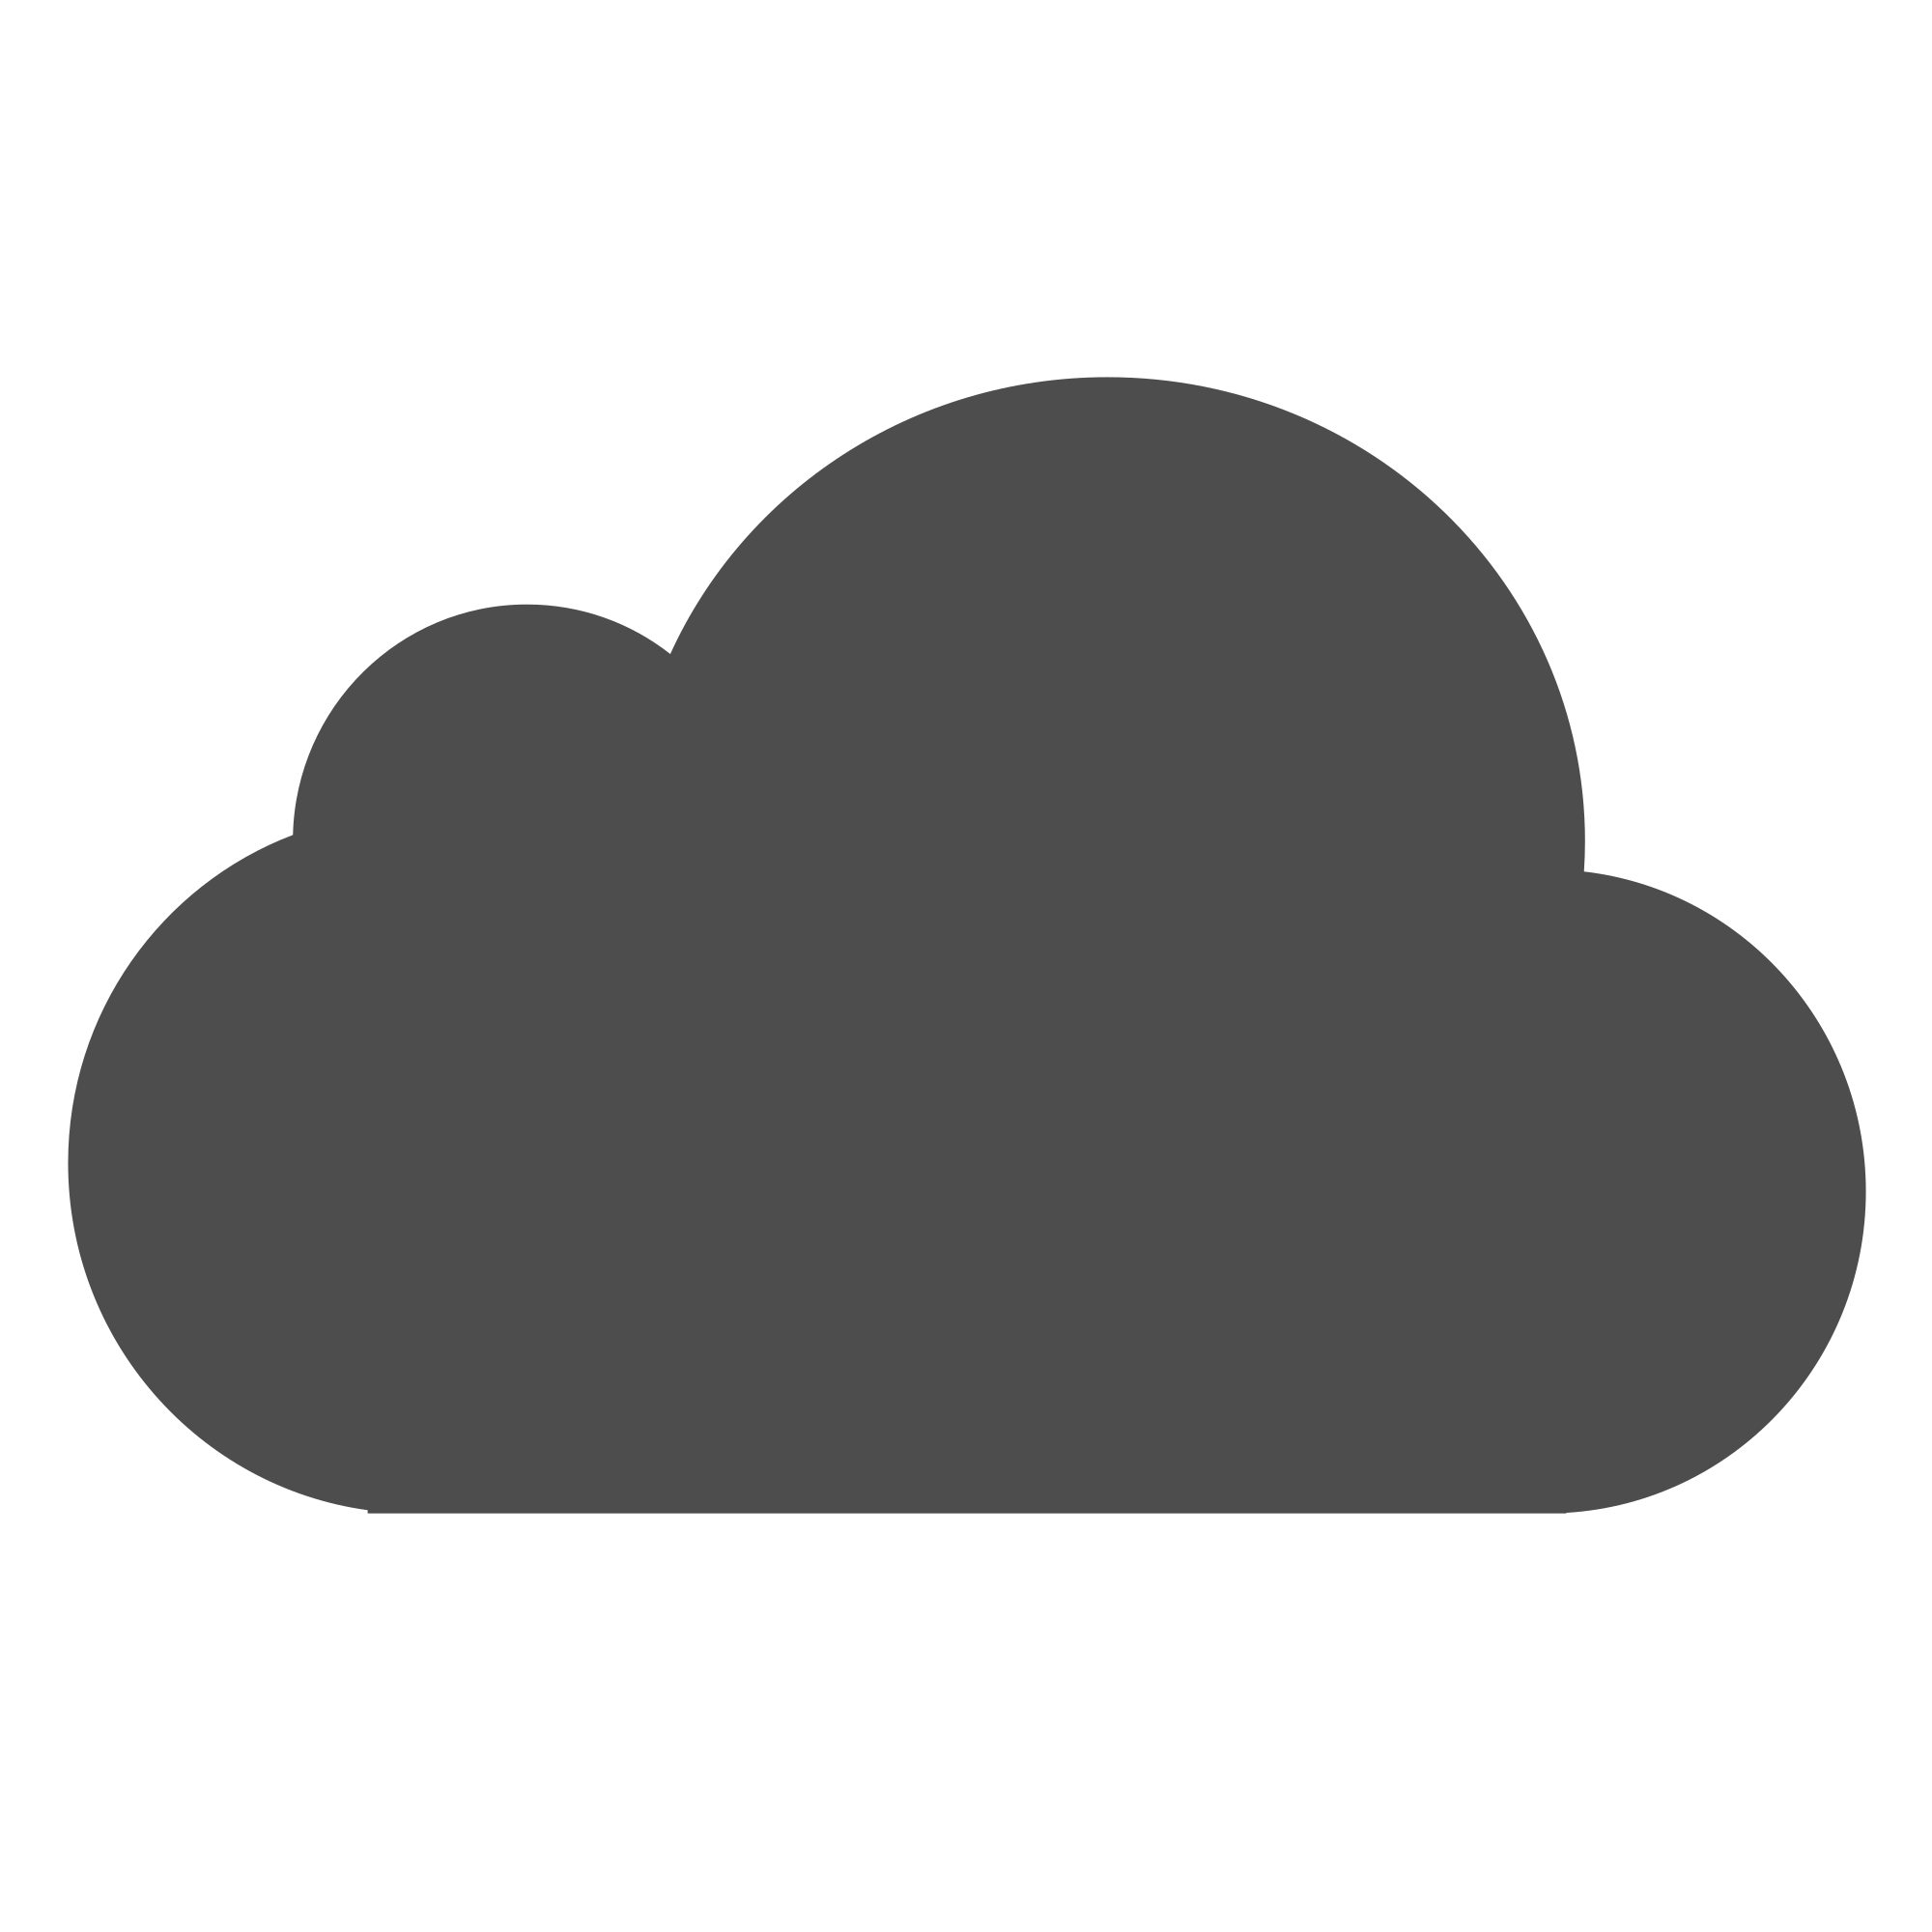 Cloud svg #44, Download drawings